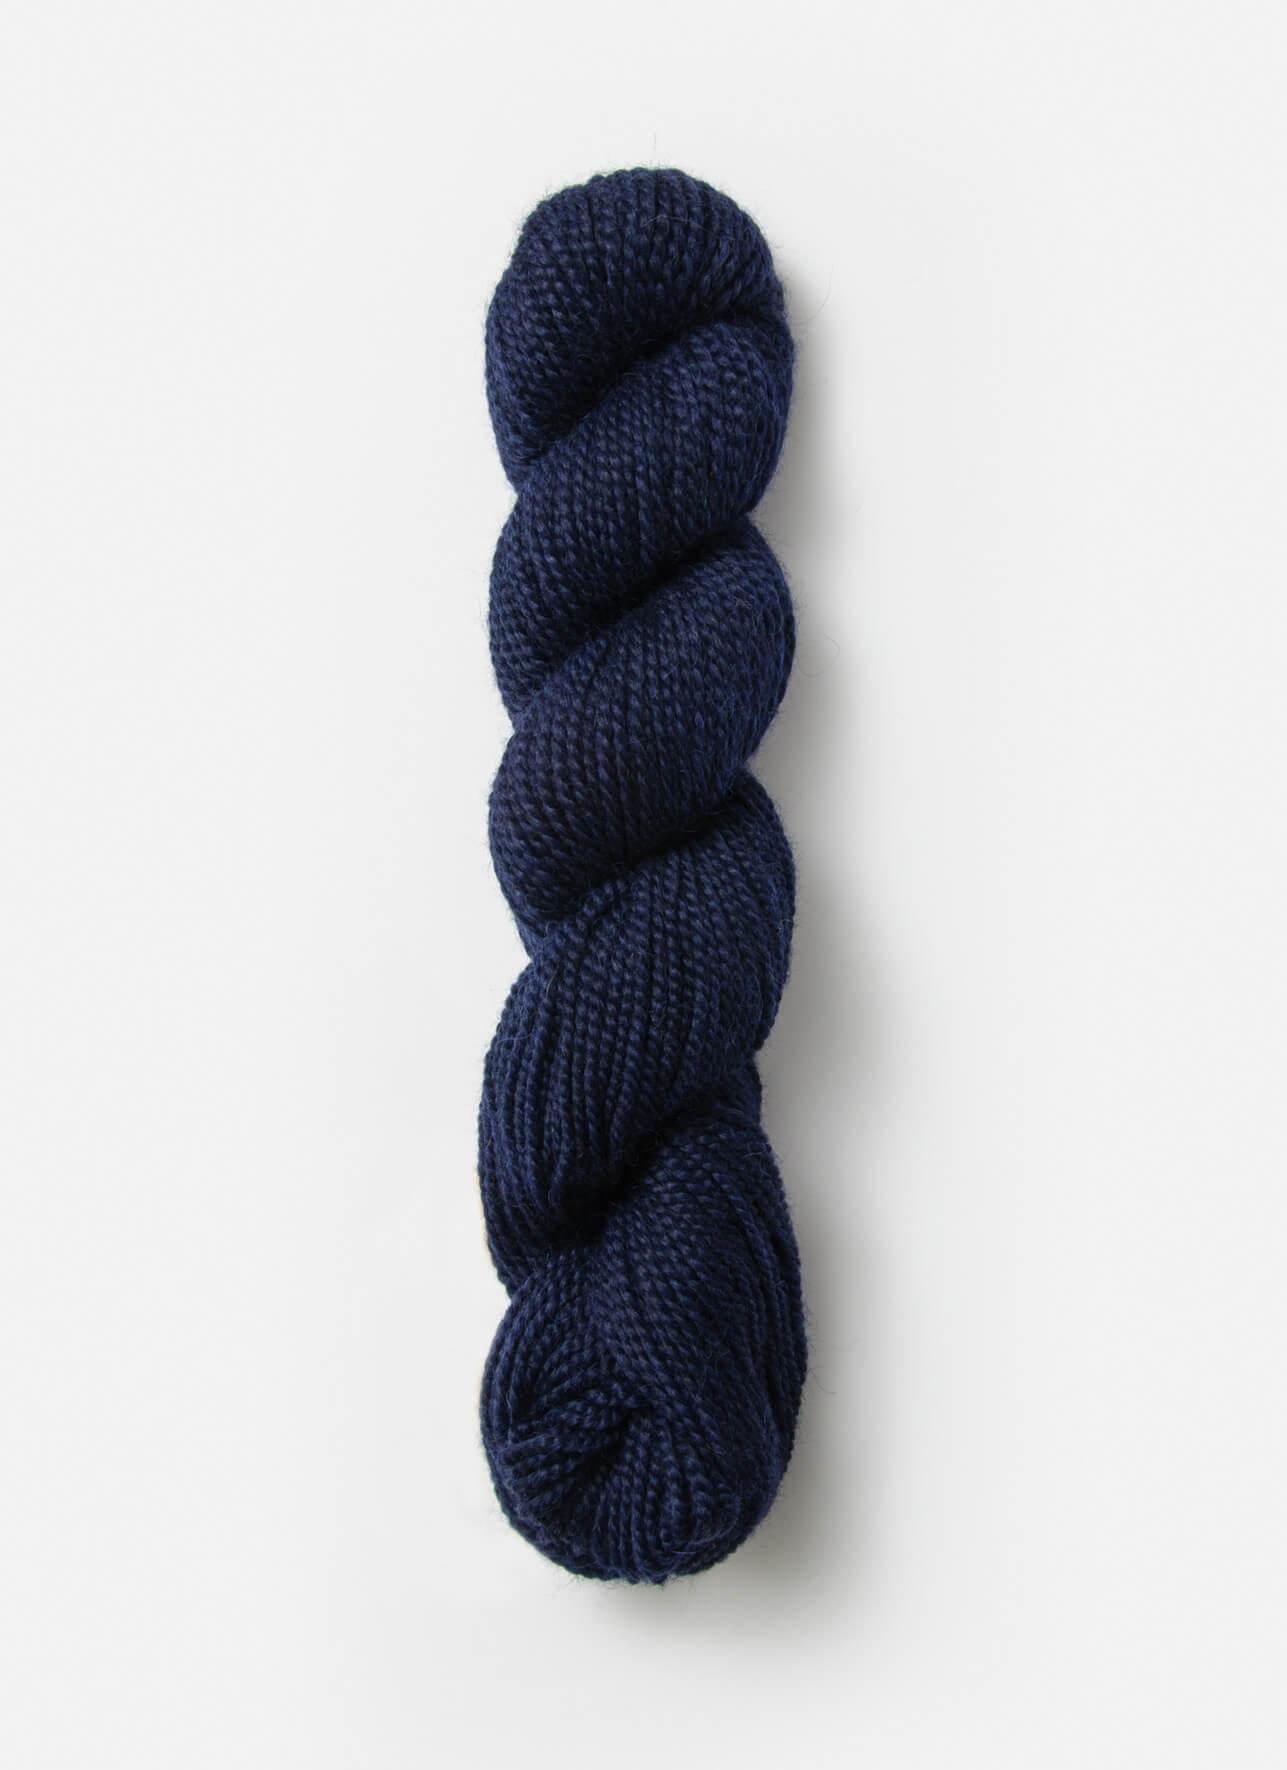 No. 533: Navy Blue